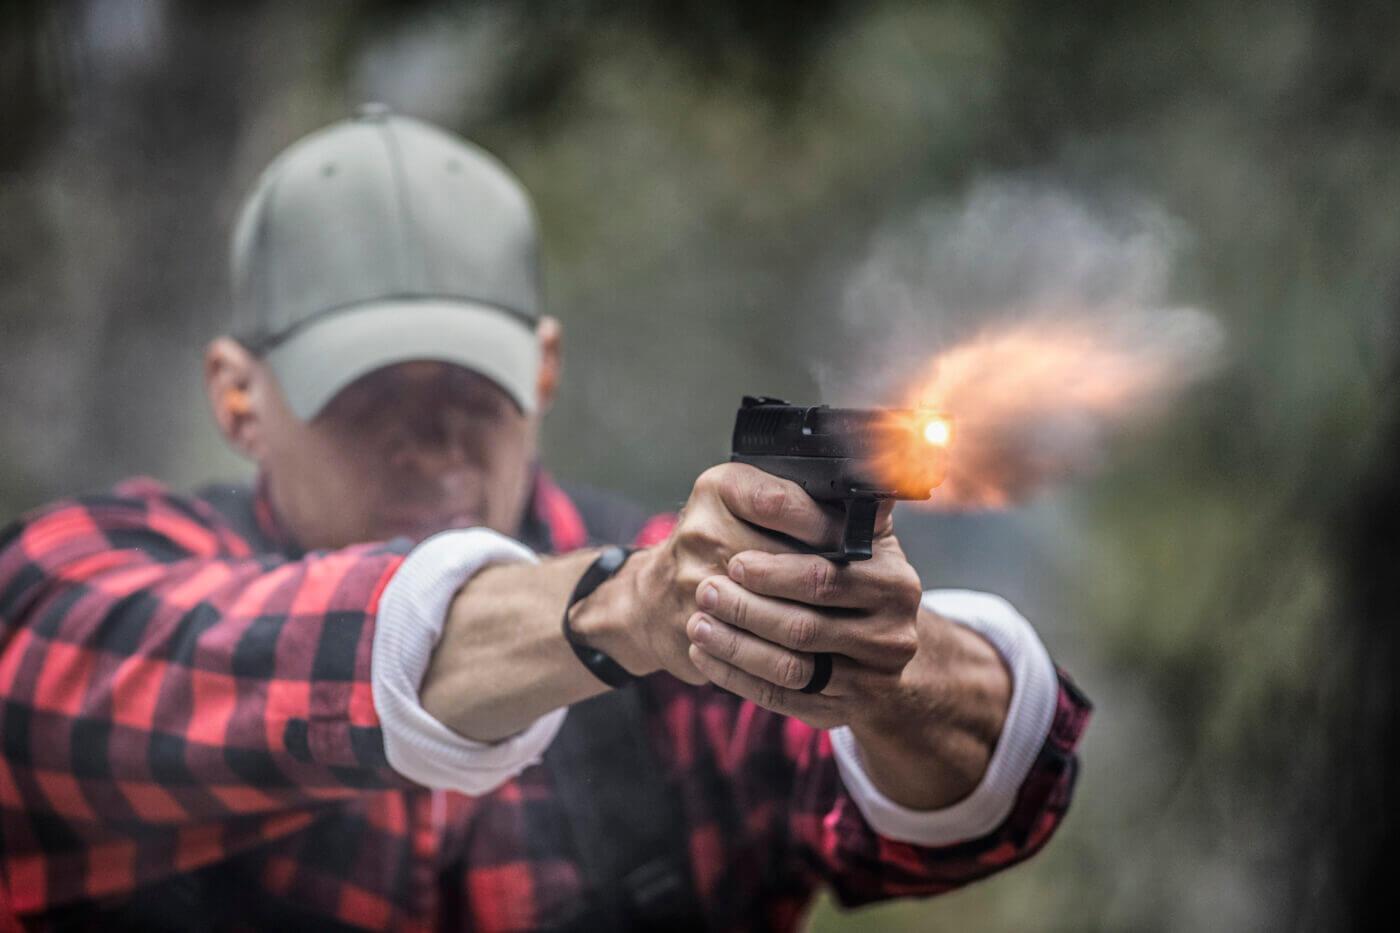 Muzzle flash from 10mm ammunition